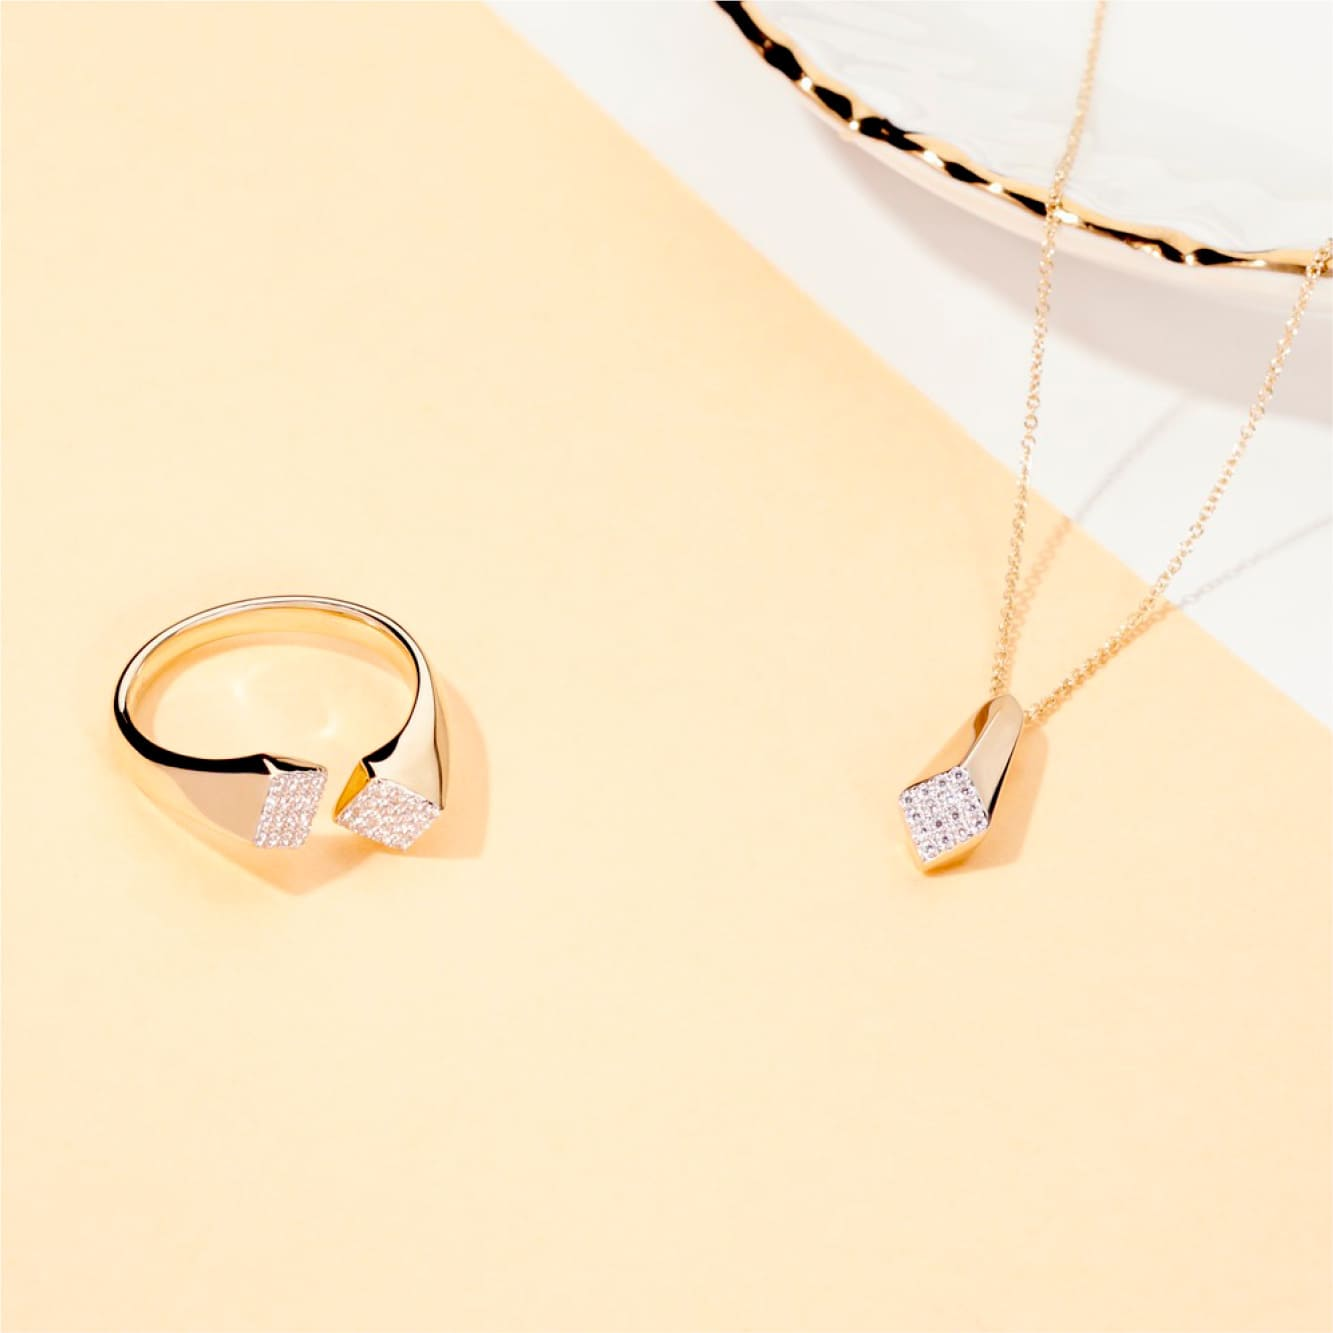 Damen Halskette Gold 375 Zirkonia